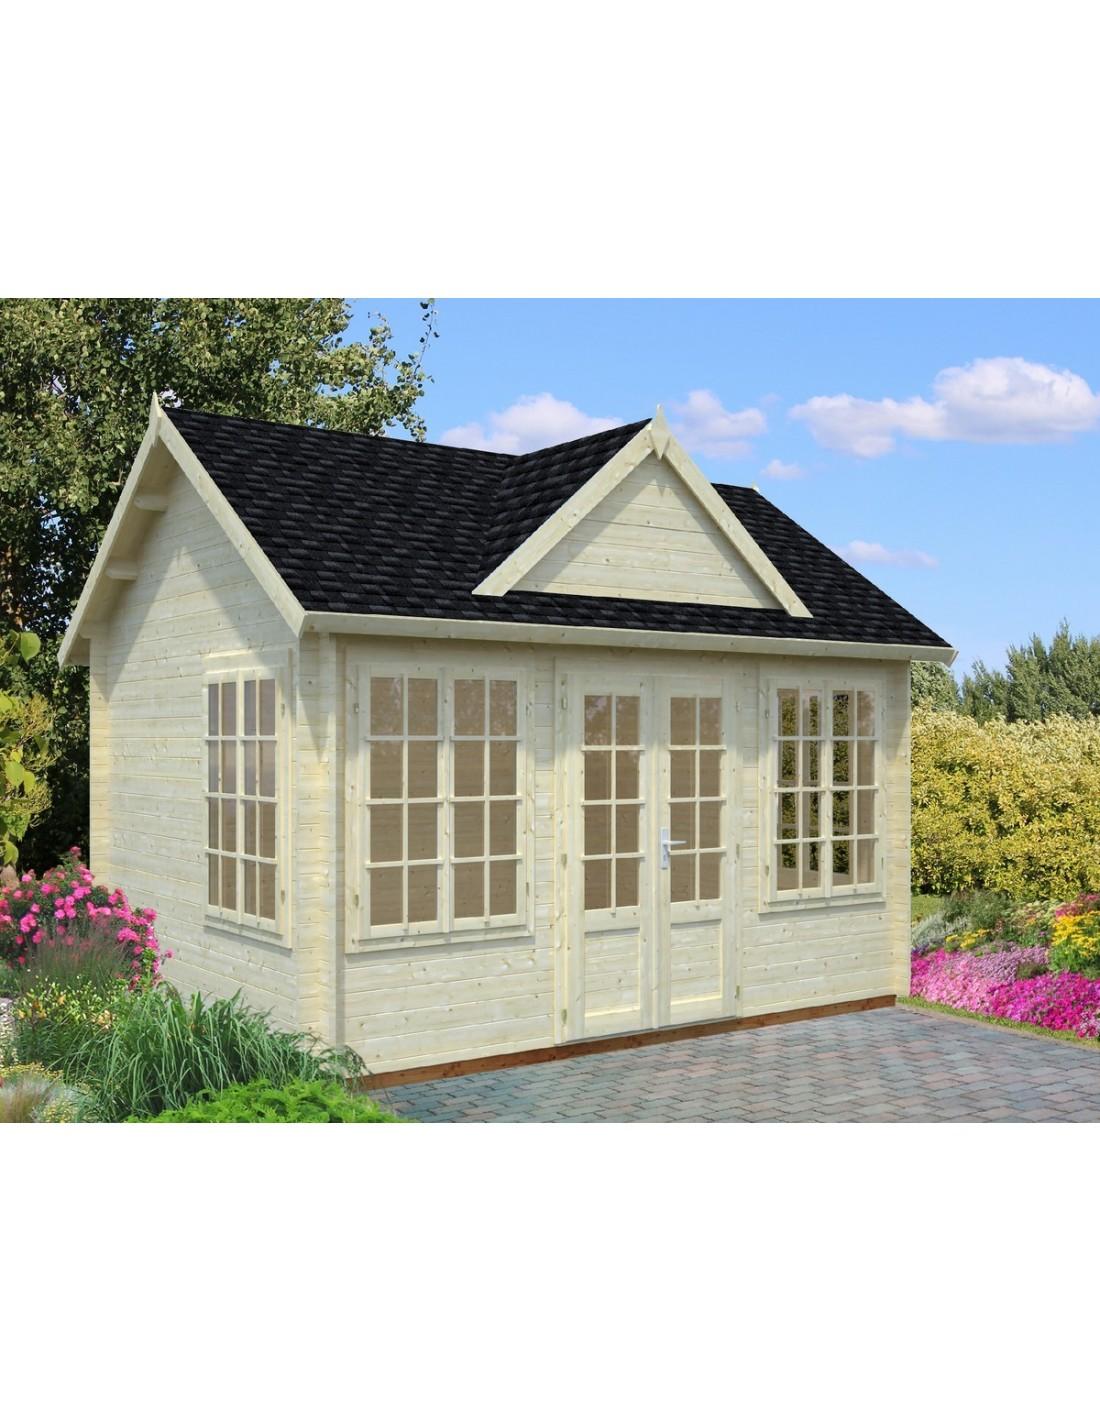 abri de jardin claudia 12 m avec plancher serres et abris. Black Bedroom Furniture Sets. Home Design Ideas